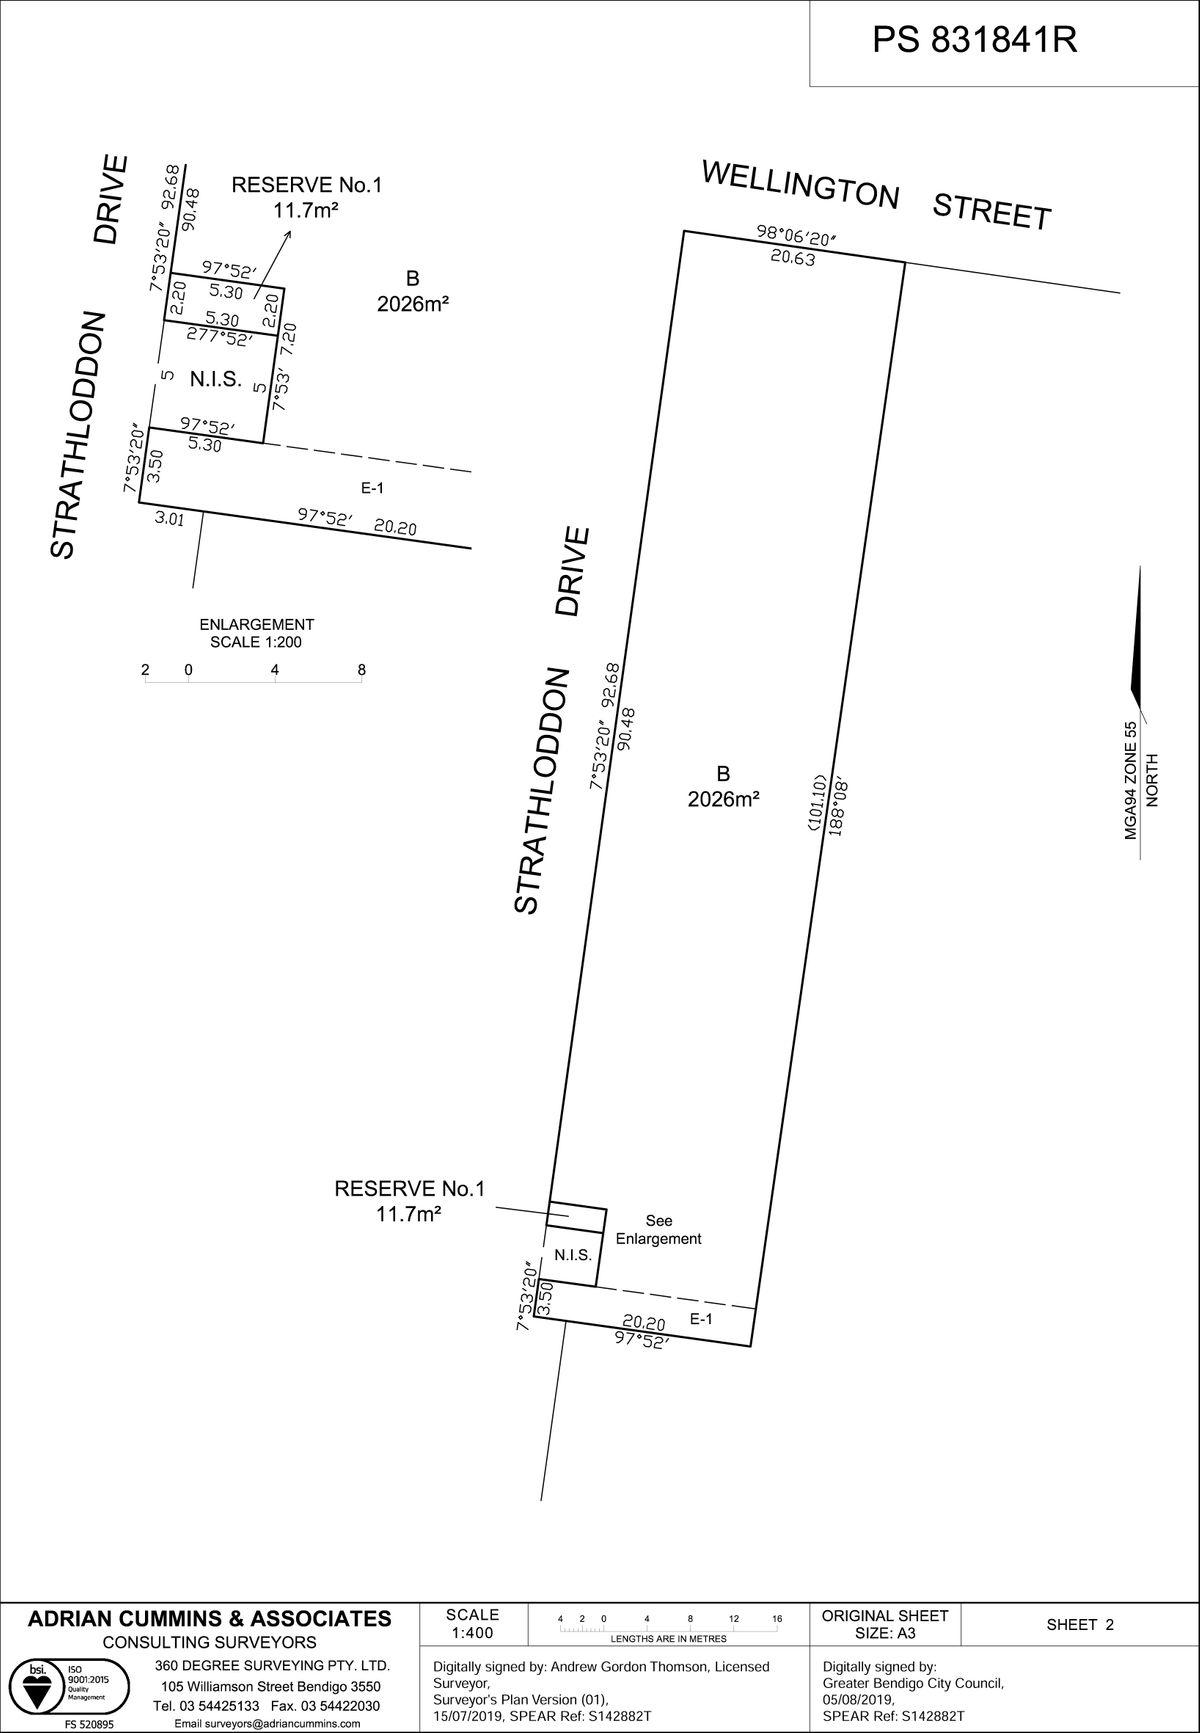 926 Wellington Street, Strathfieldsaye, VIC 3551